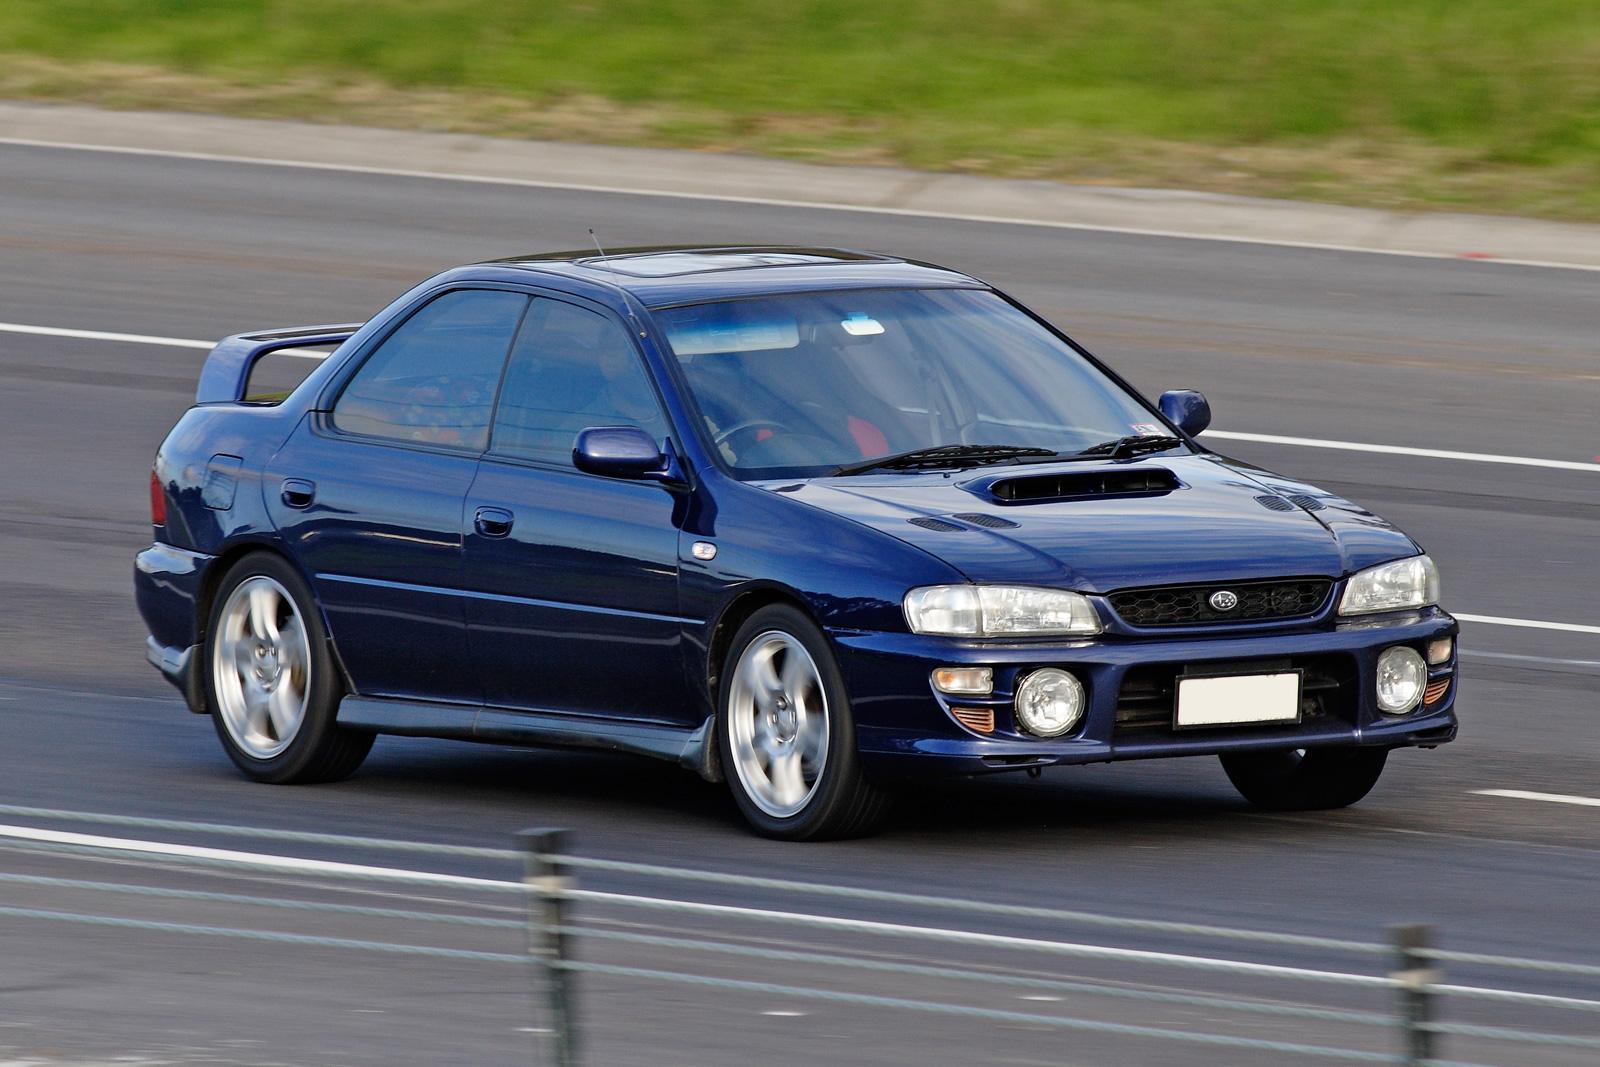 file:1999–2000 subaru impreza wrx sedan - wikimedia commons